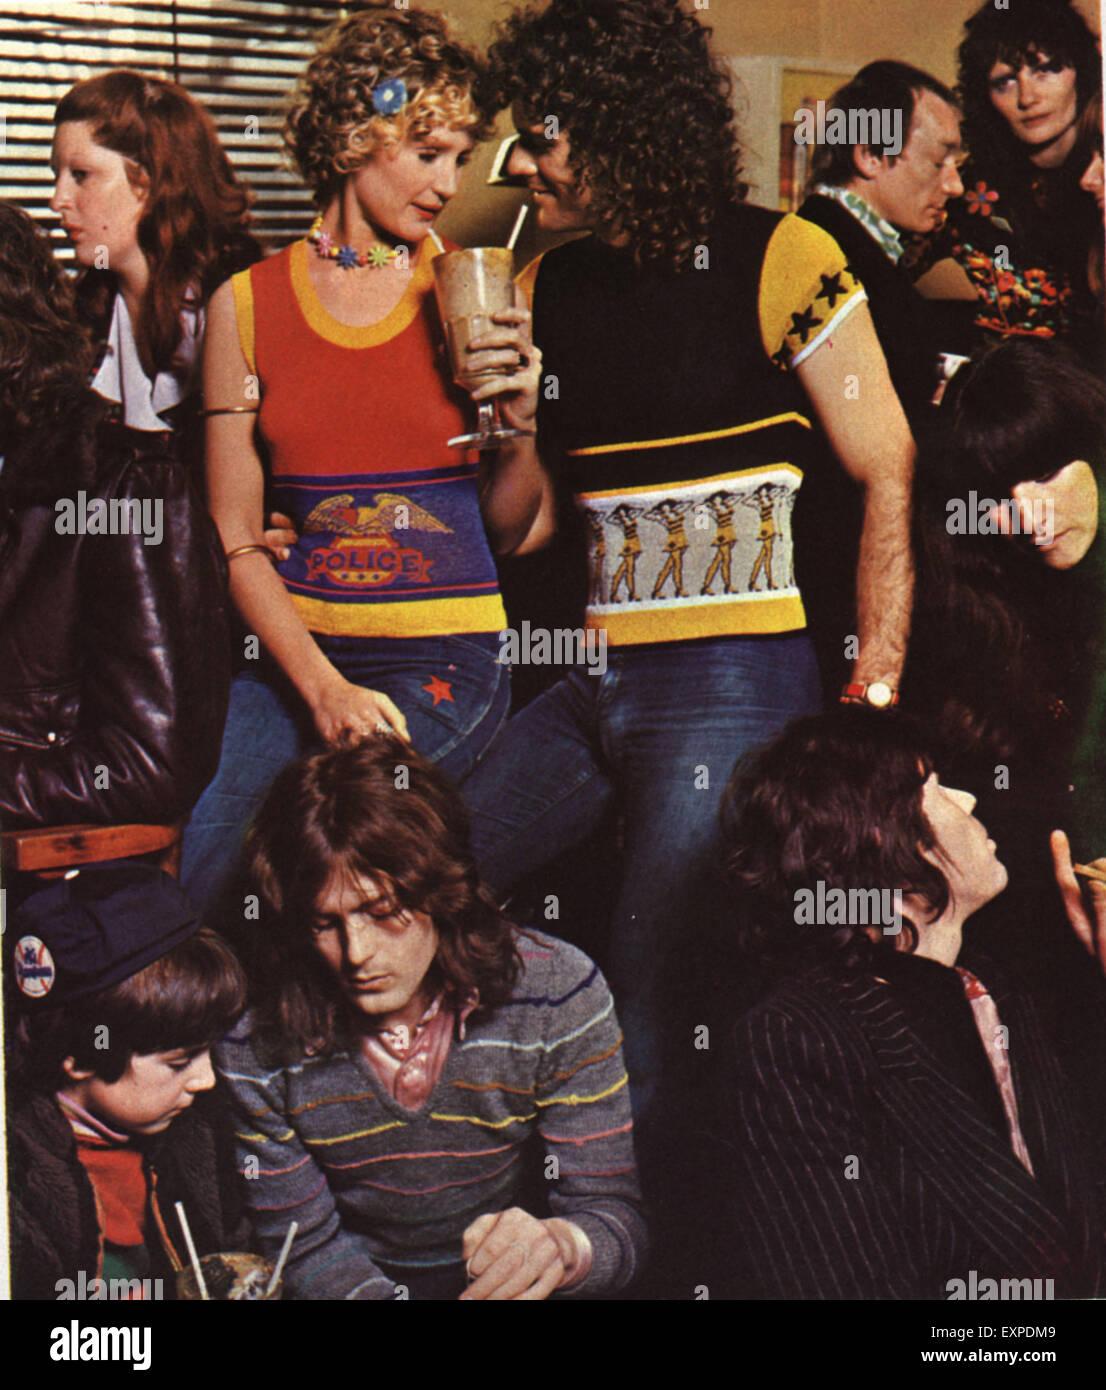 1970s UK Marshall Lester Magazine Advert (detail) - Stock Image